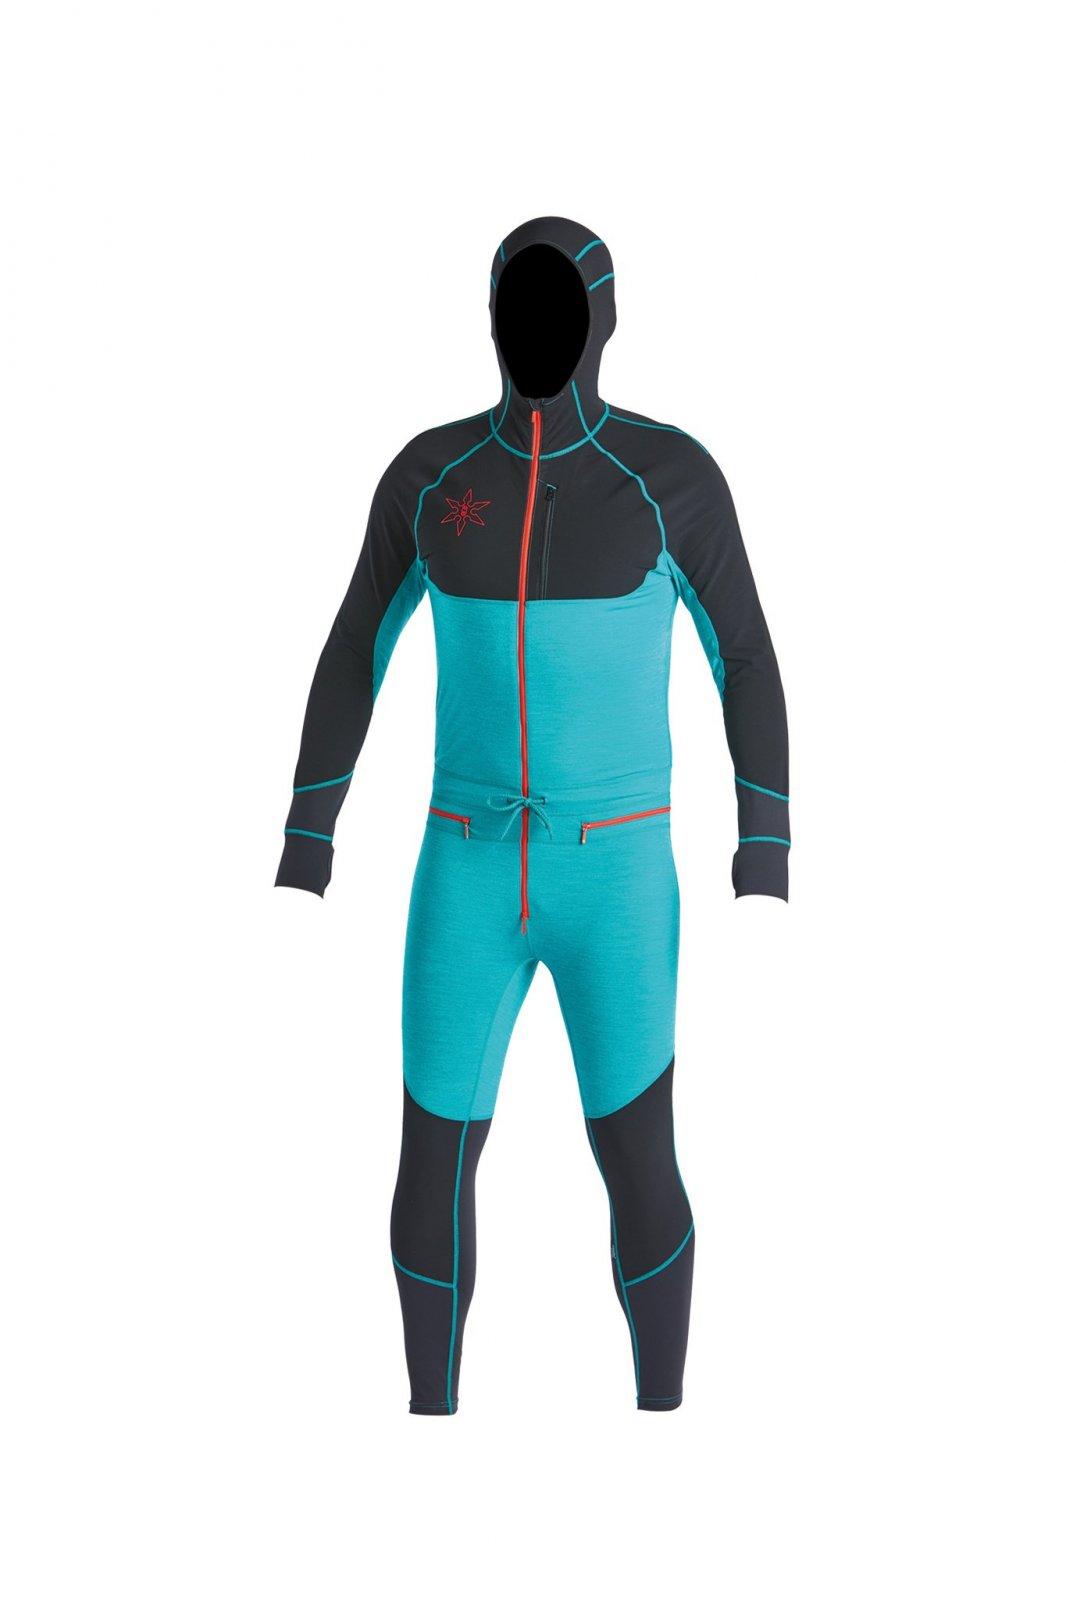 Airblaster Ninja Suit Pro